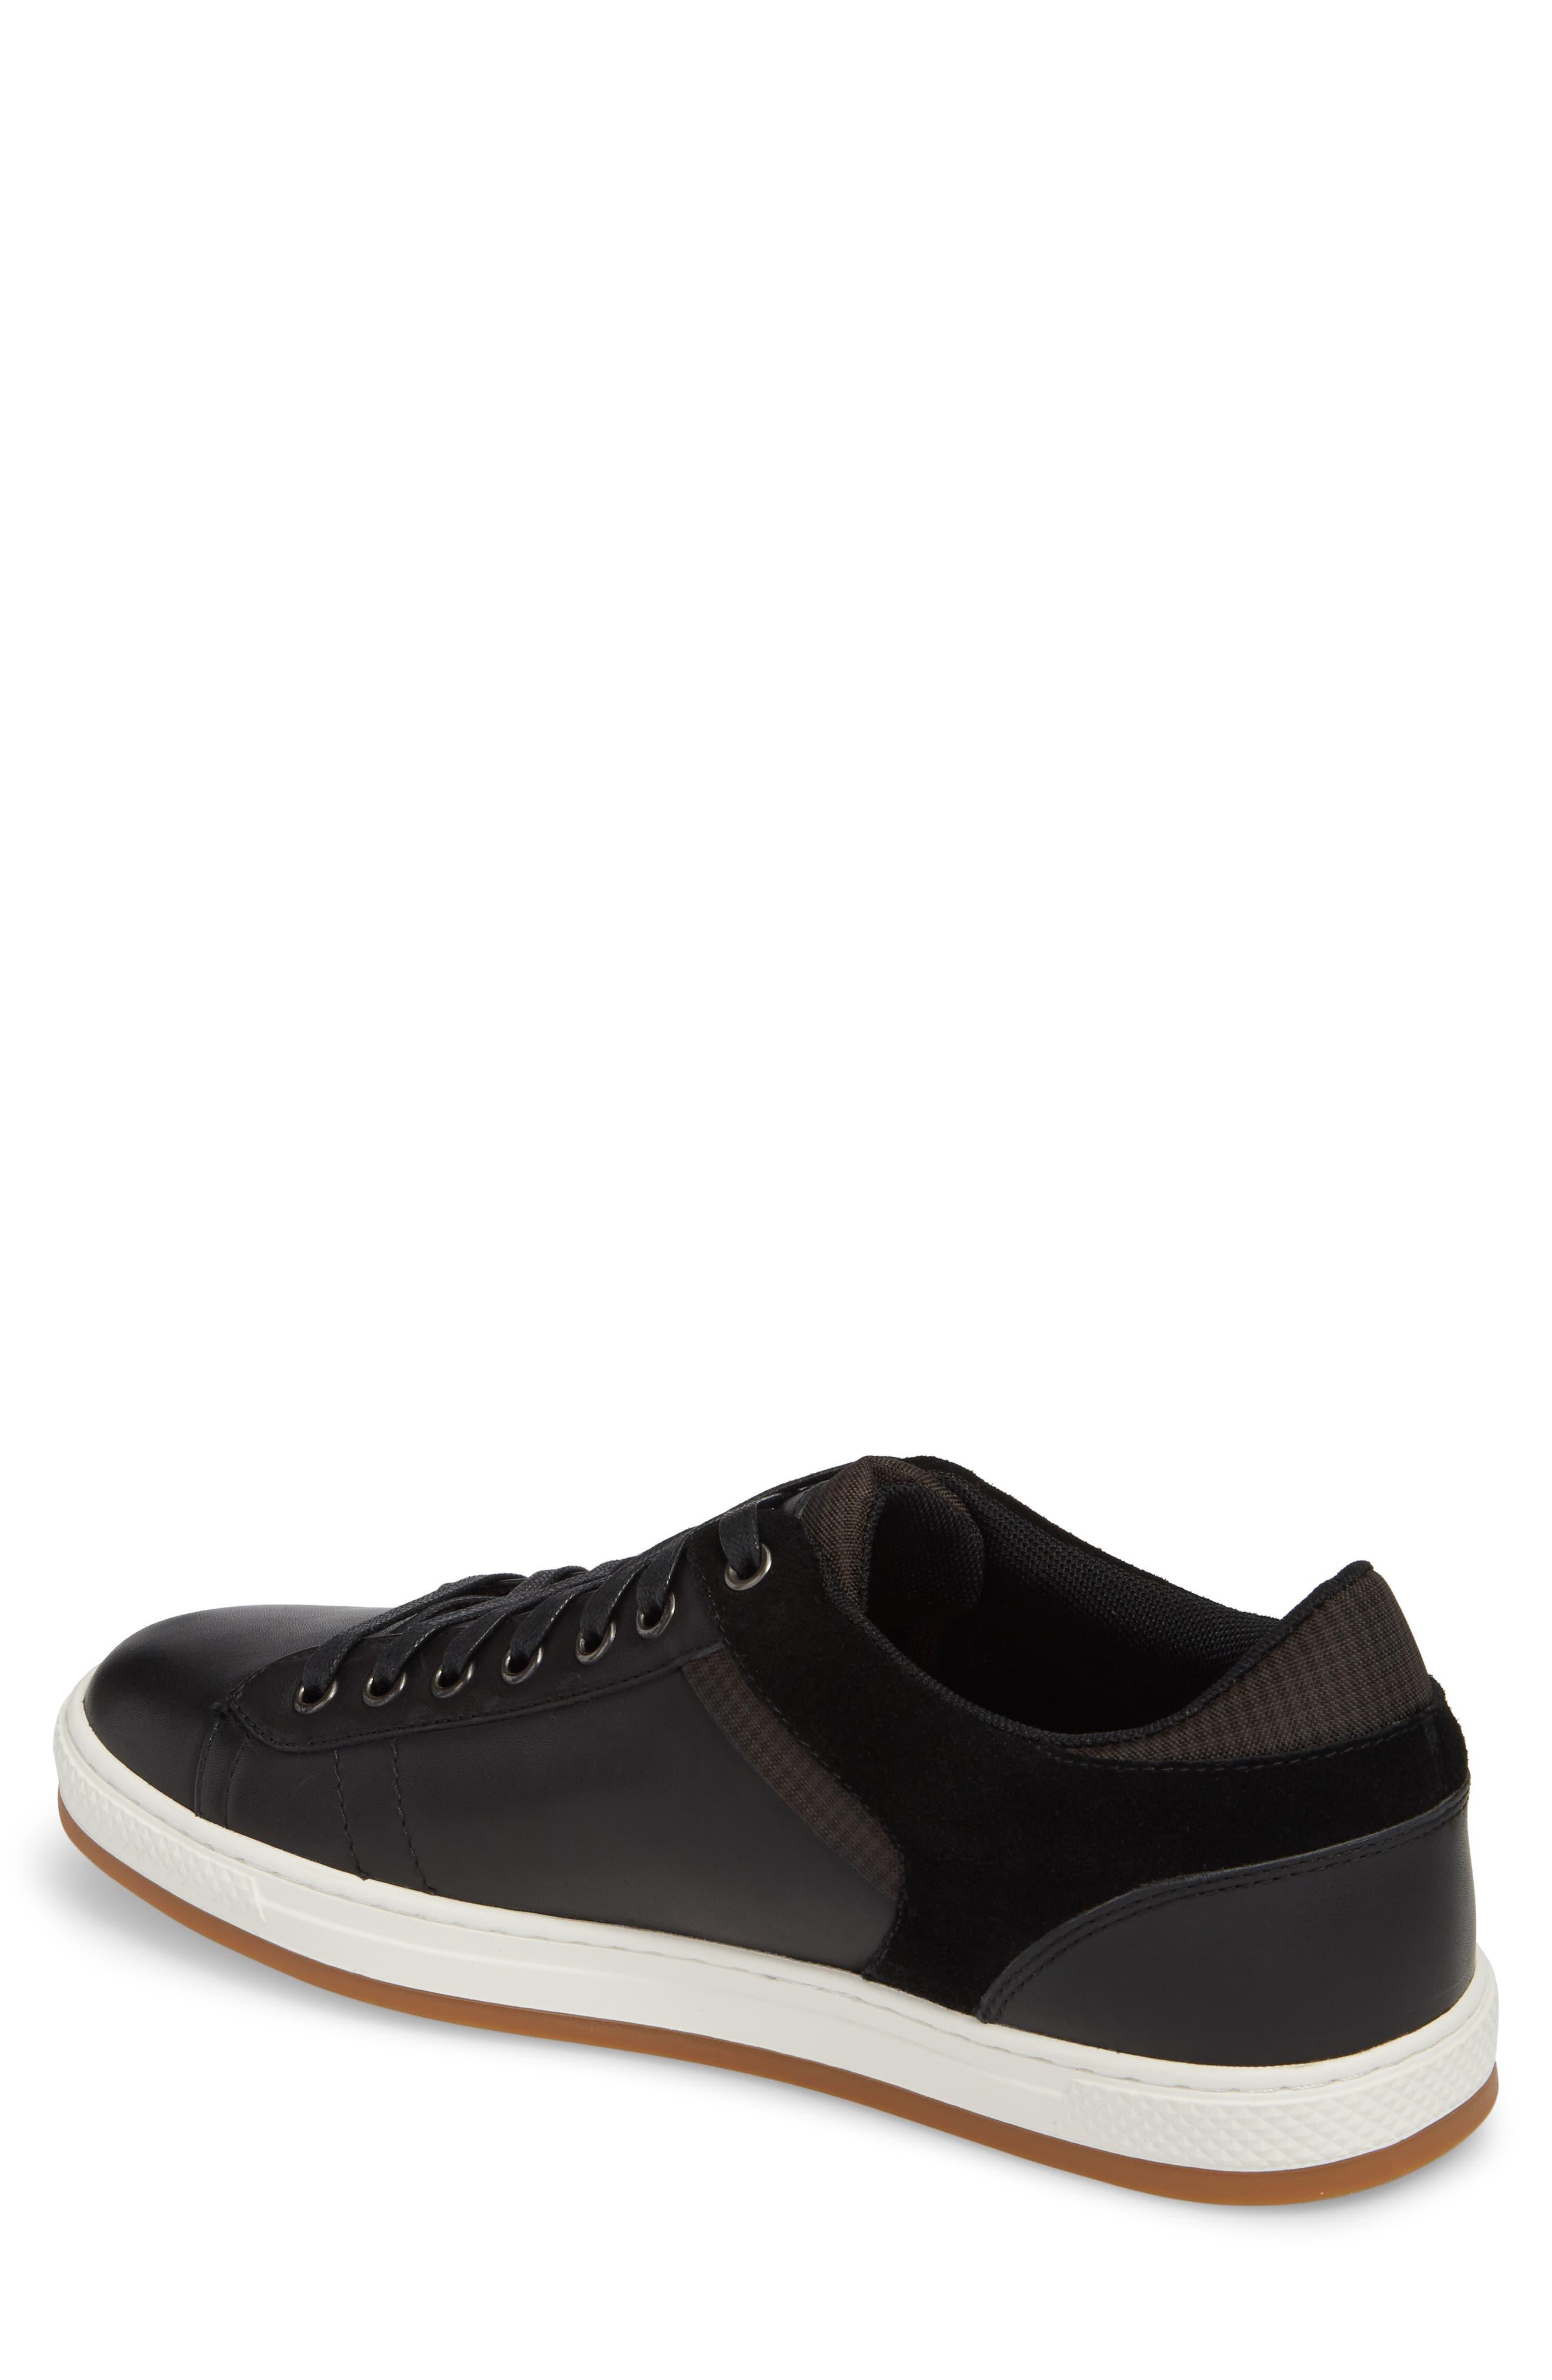 Ireton Low Top Sneaker,                             Alternate thumbnail 2, color,                             BLACK LEATHER/ SUEDE